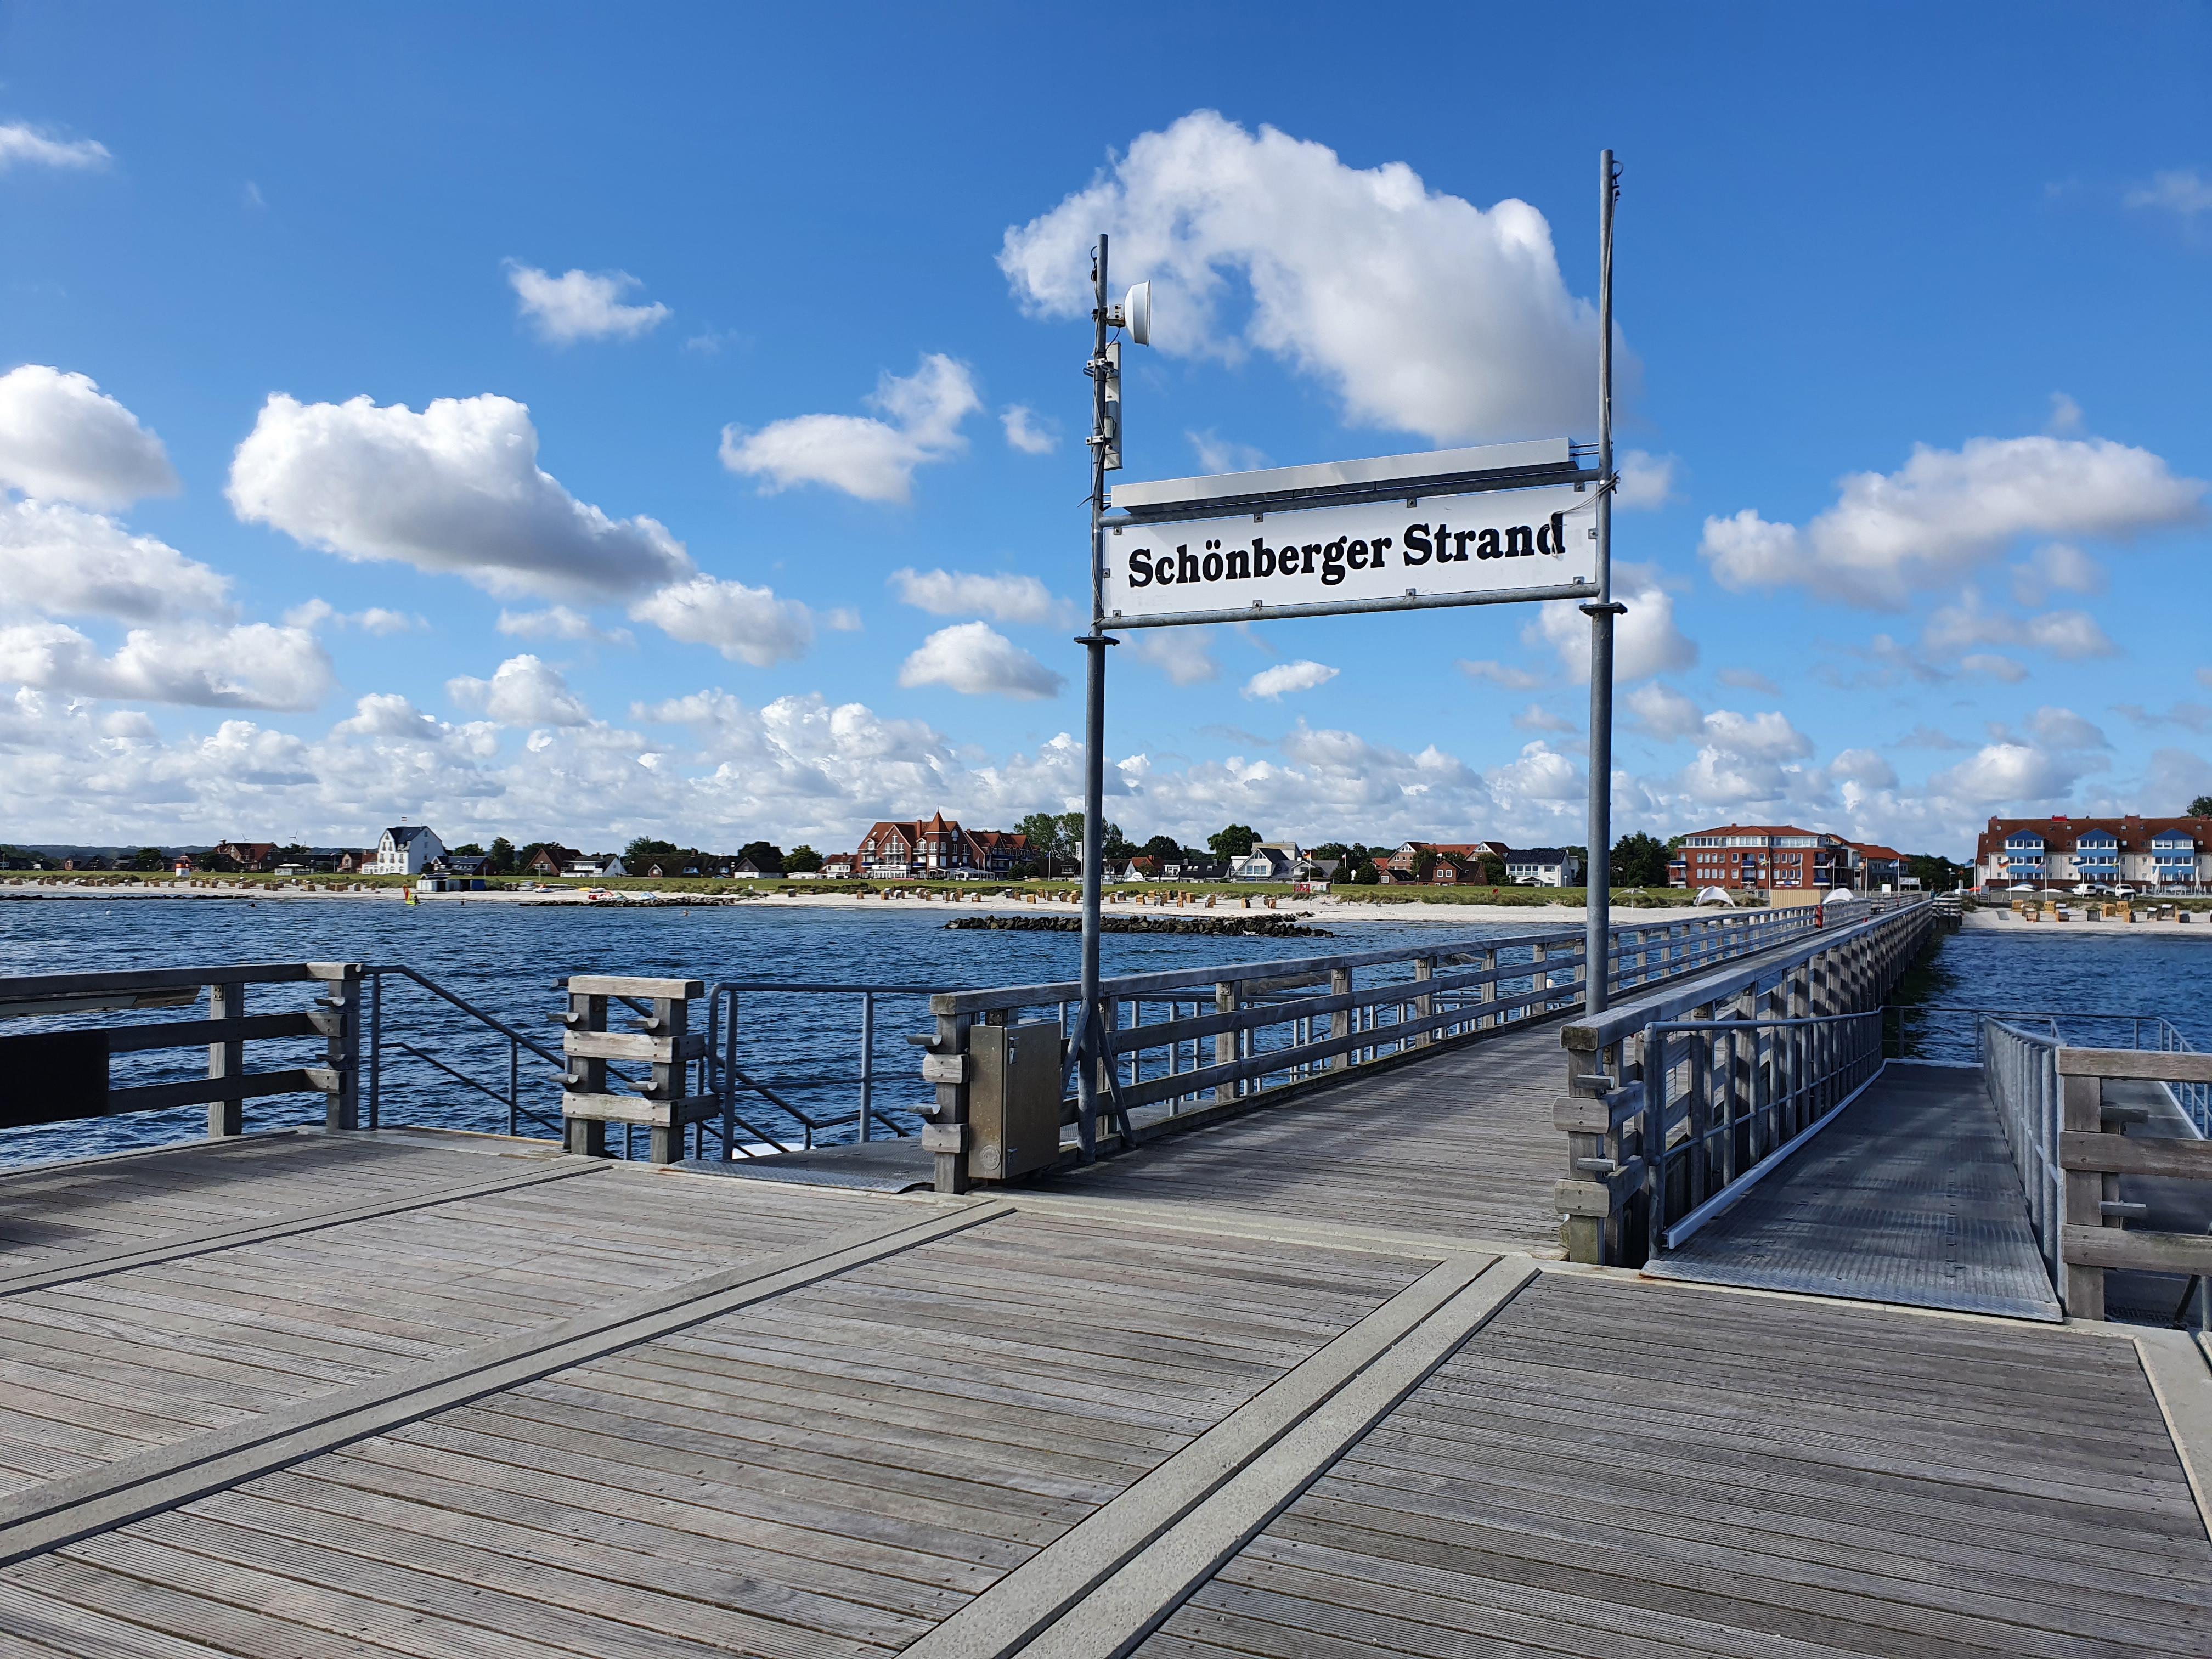 Schönberg Strand mit Seebrücke